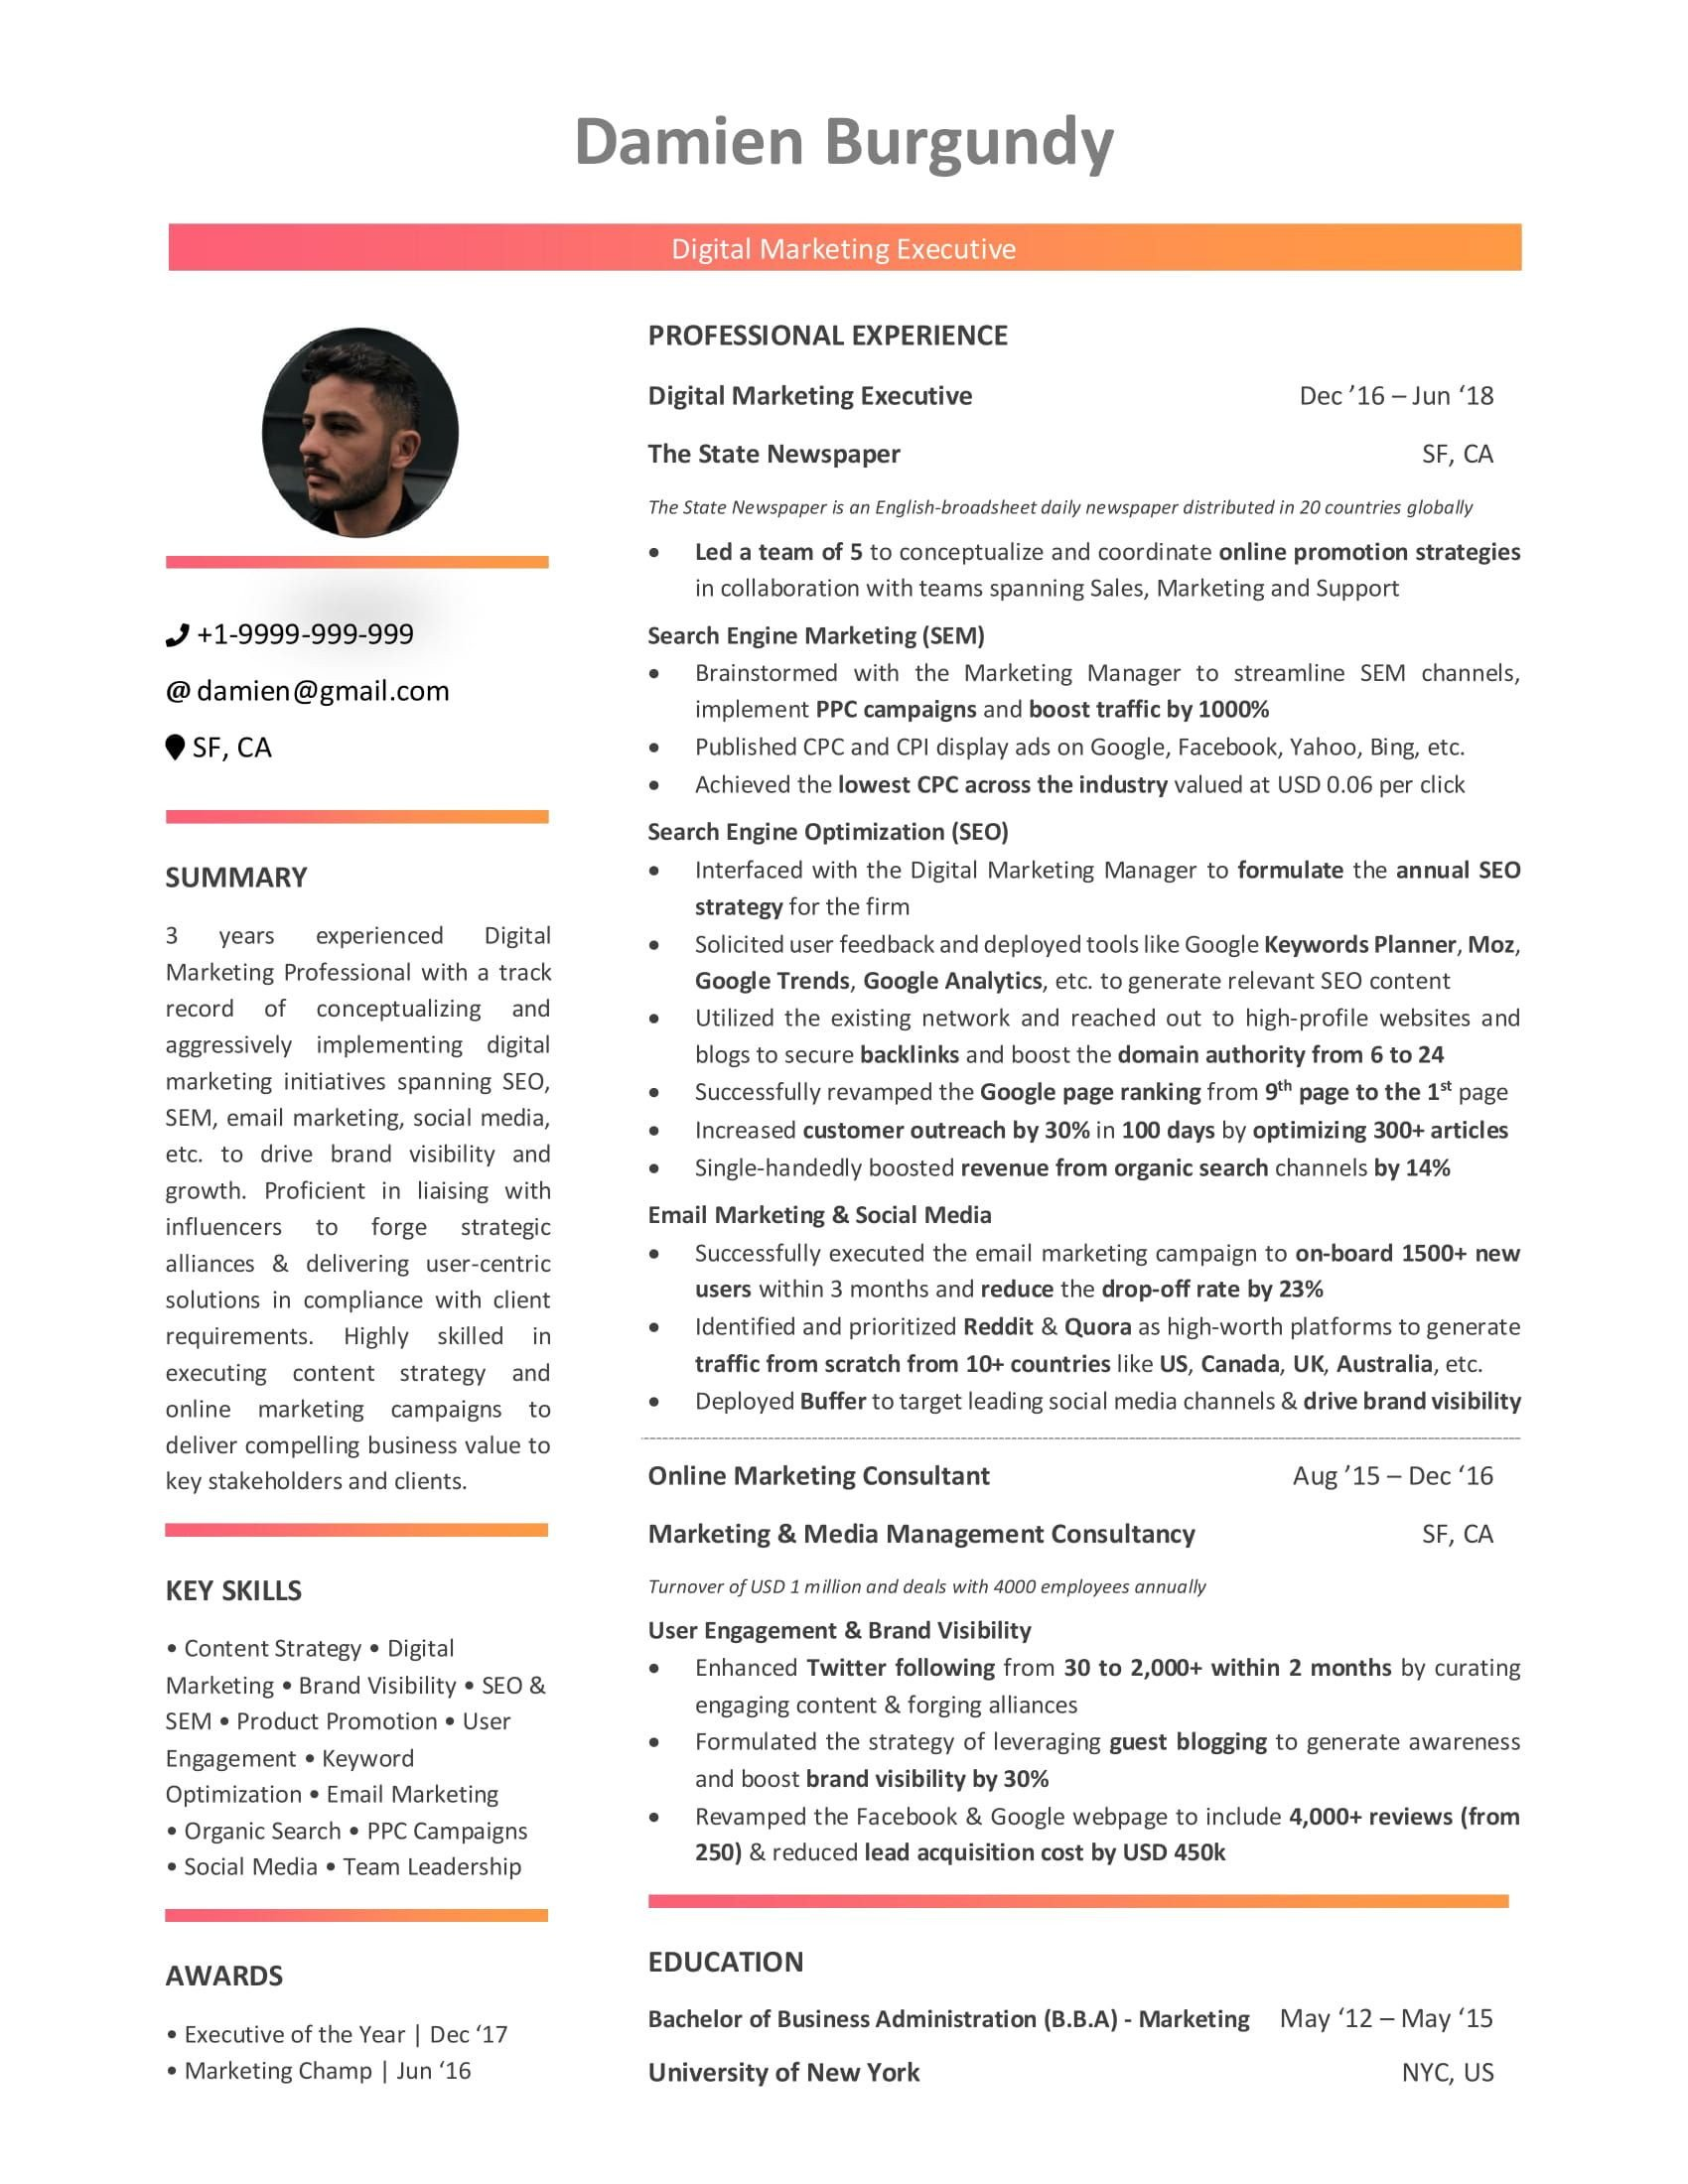 Digital Marketing Resume Sample Digital Marketing Resume 10 Step Beginner S Guide [with